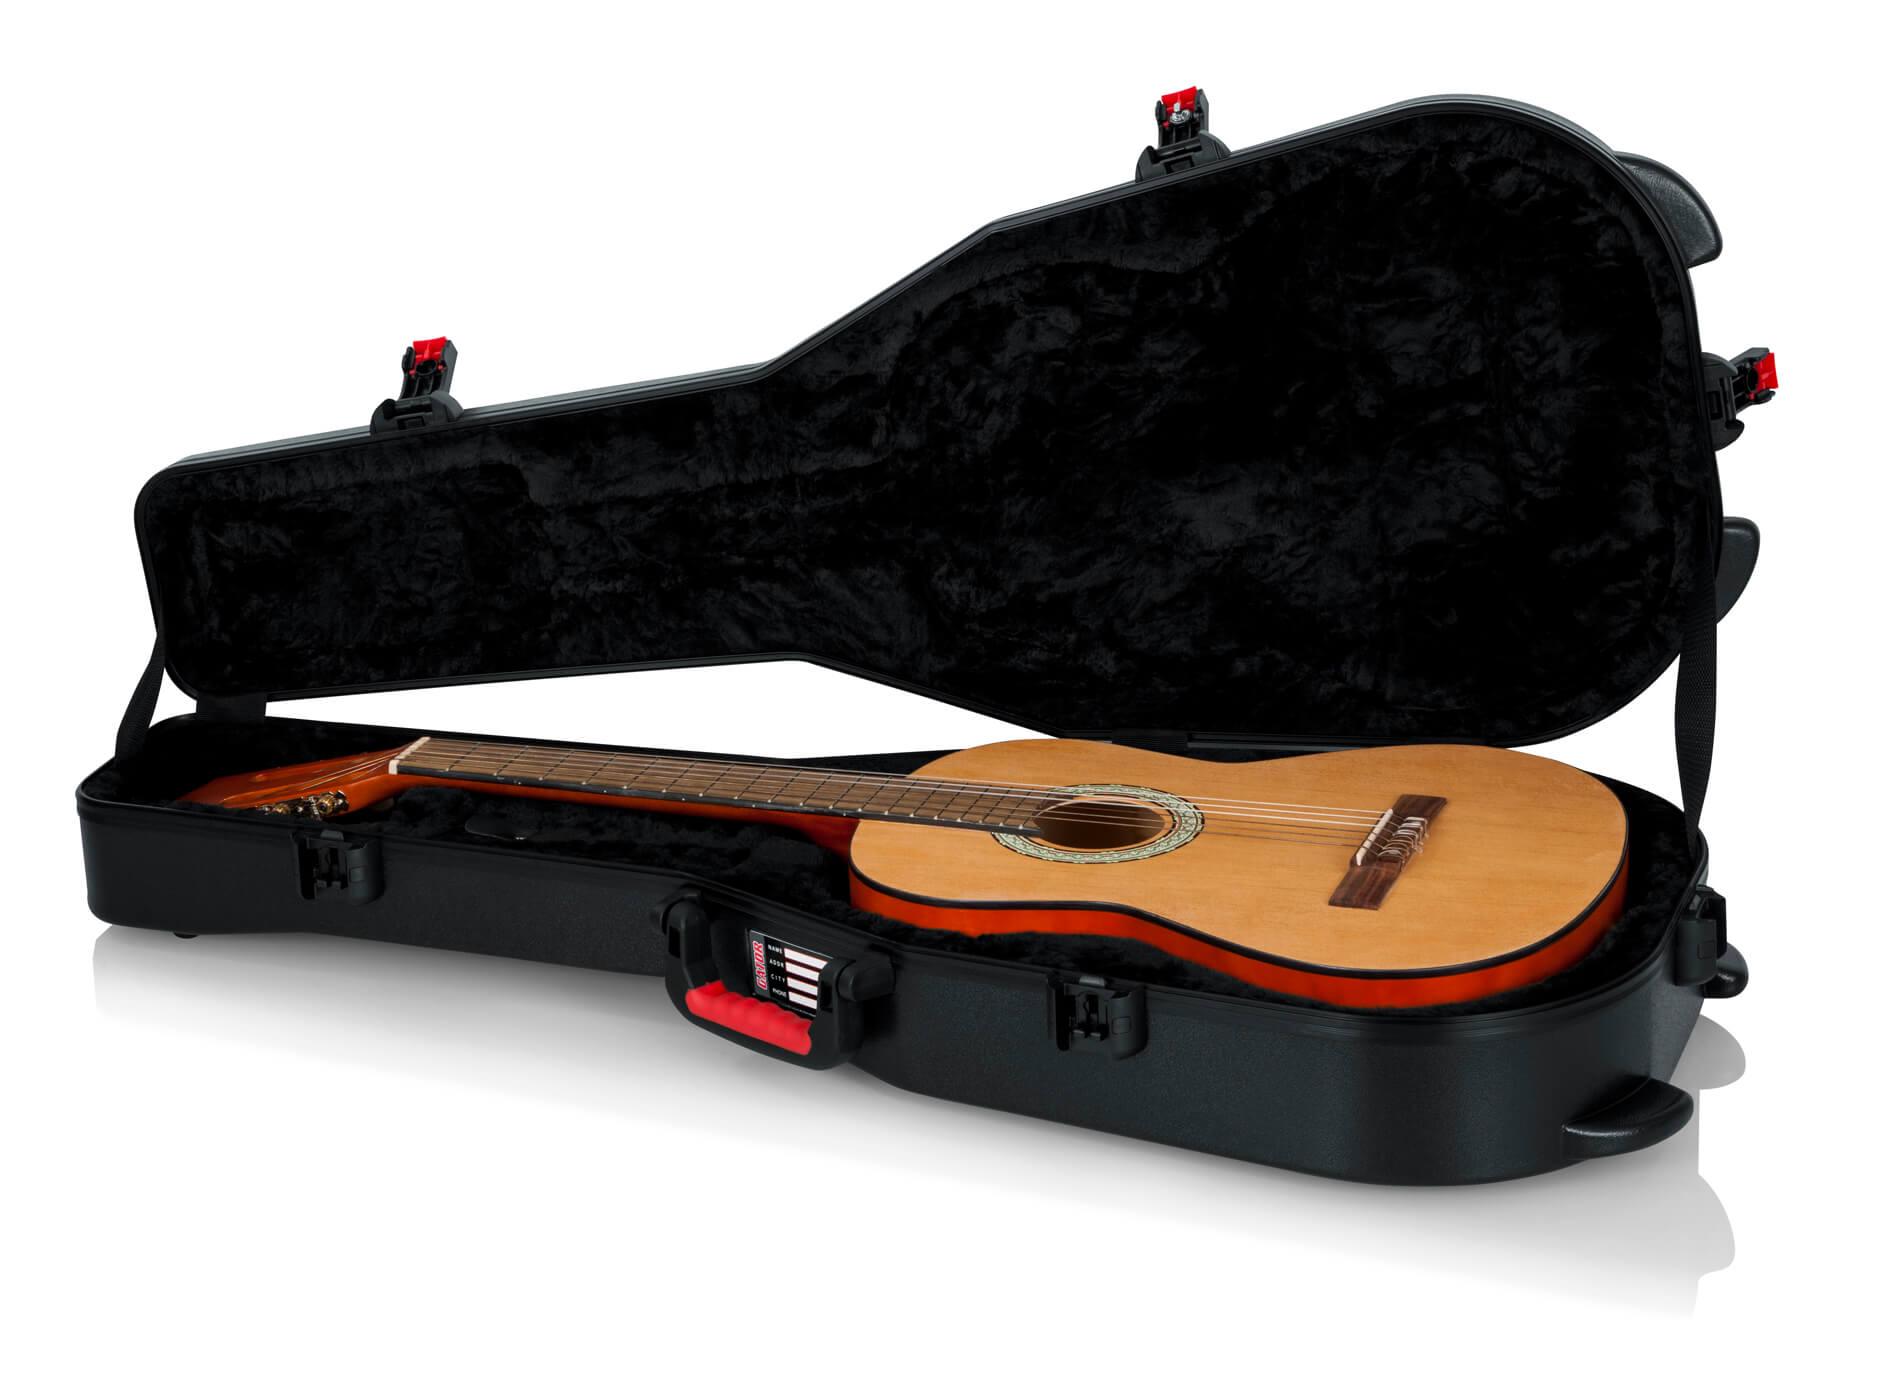 series tsa guitar gator cases. Black Bedroom Furniture Sets. Home Design Ideas